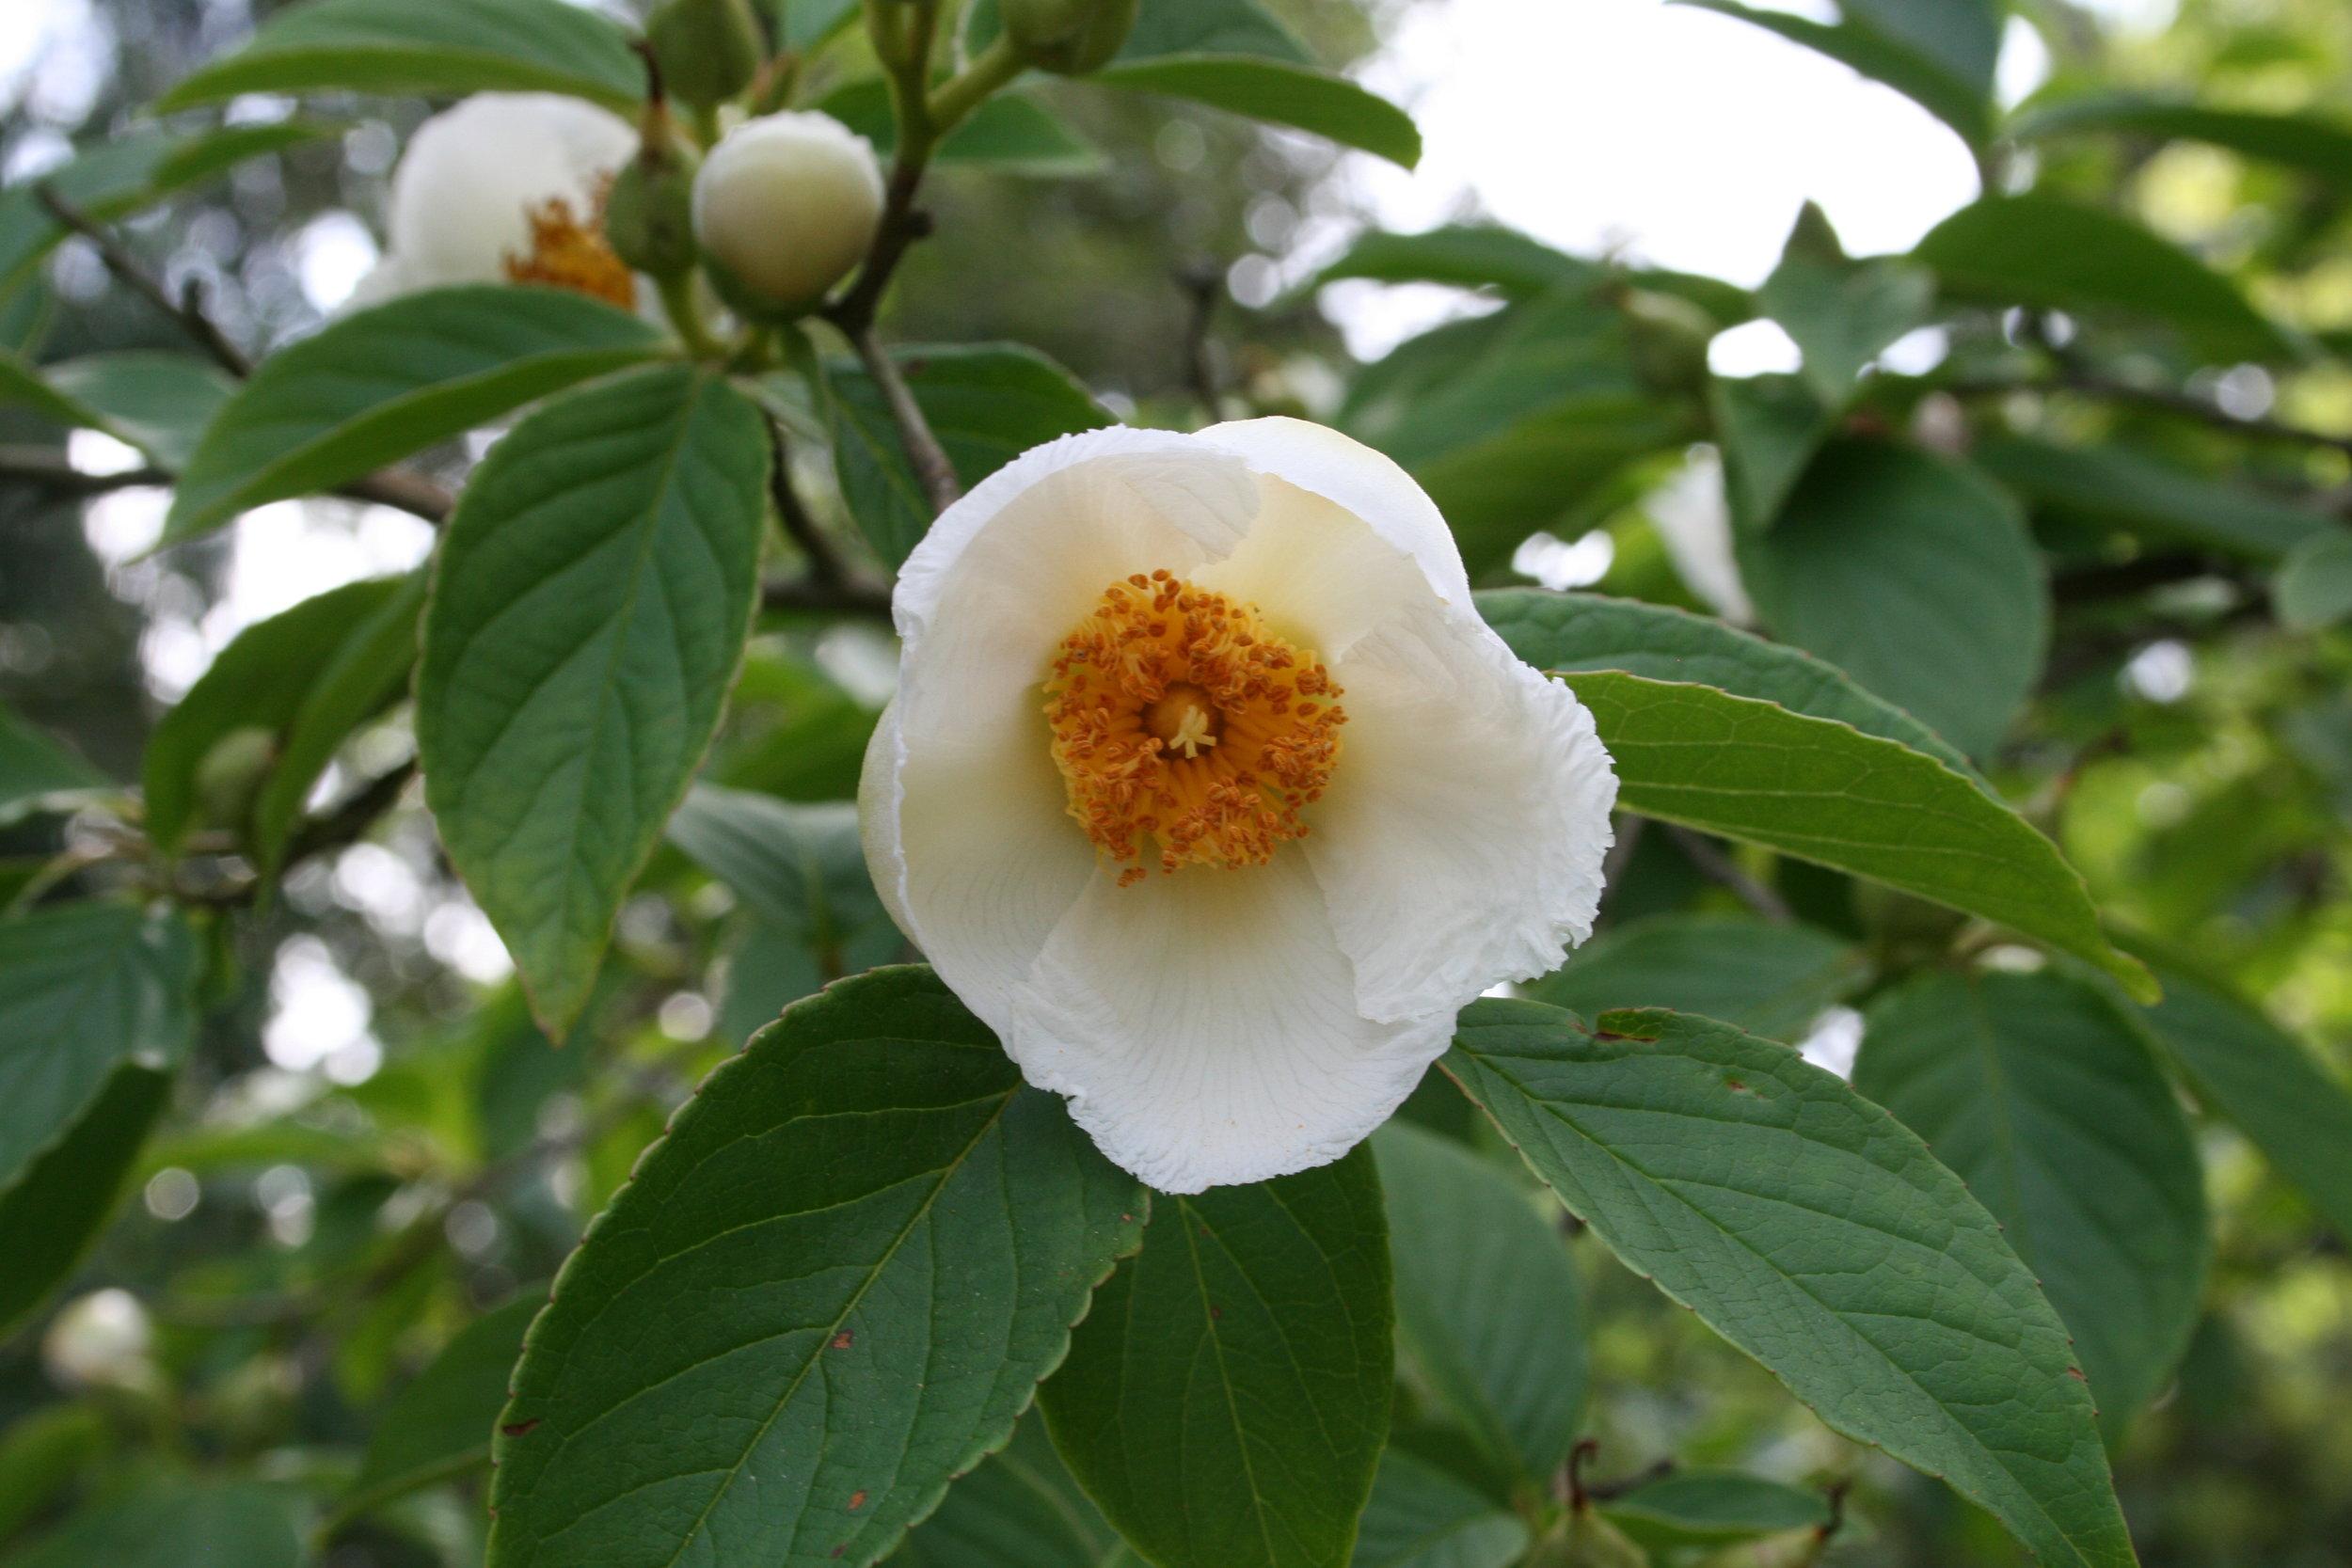 Japanese stewartia flower (photo: Uleli; Creative Commons-Share Alike 3.0 Unported License)